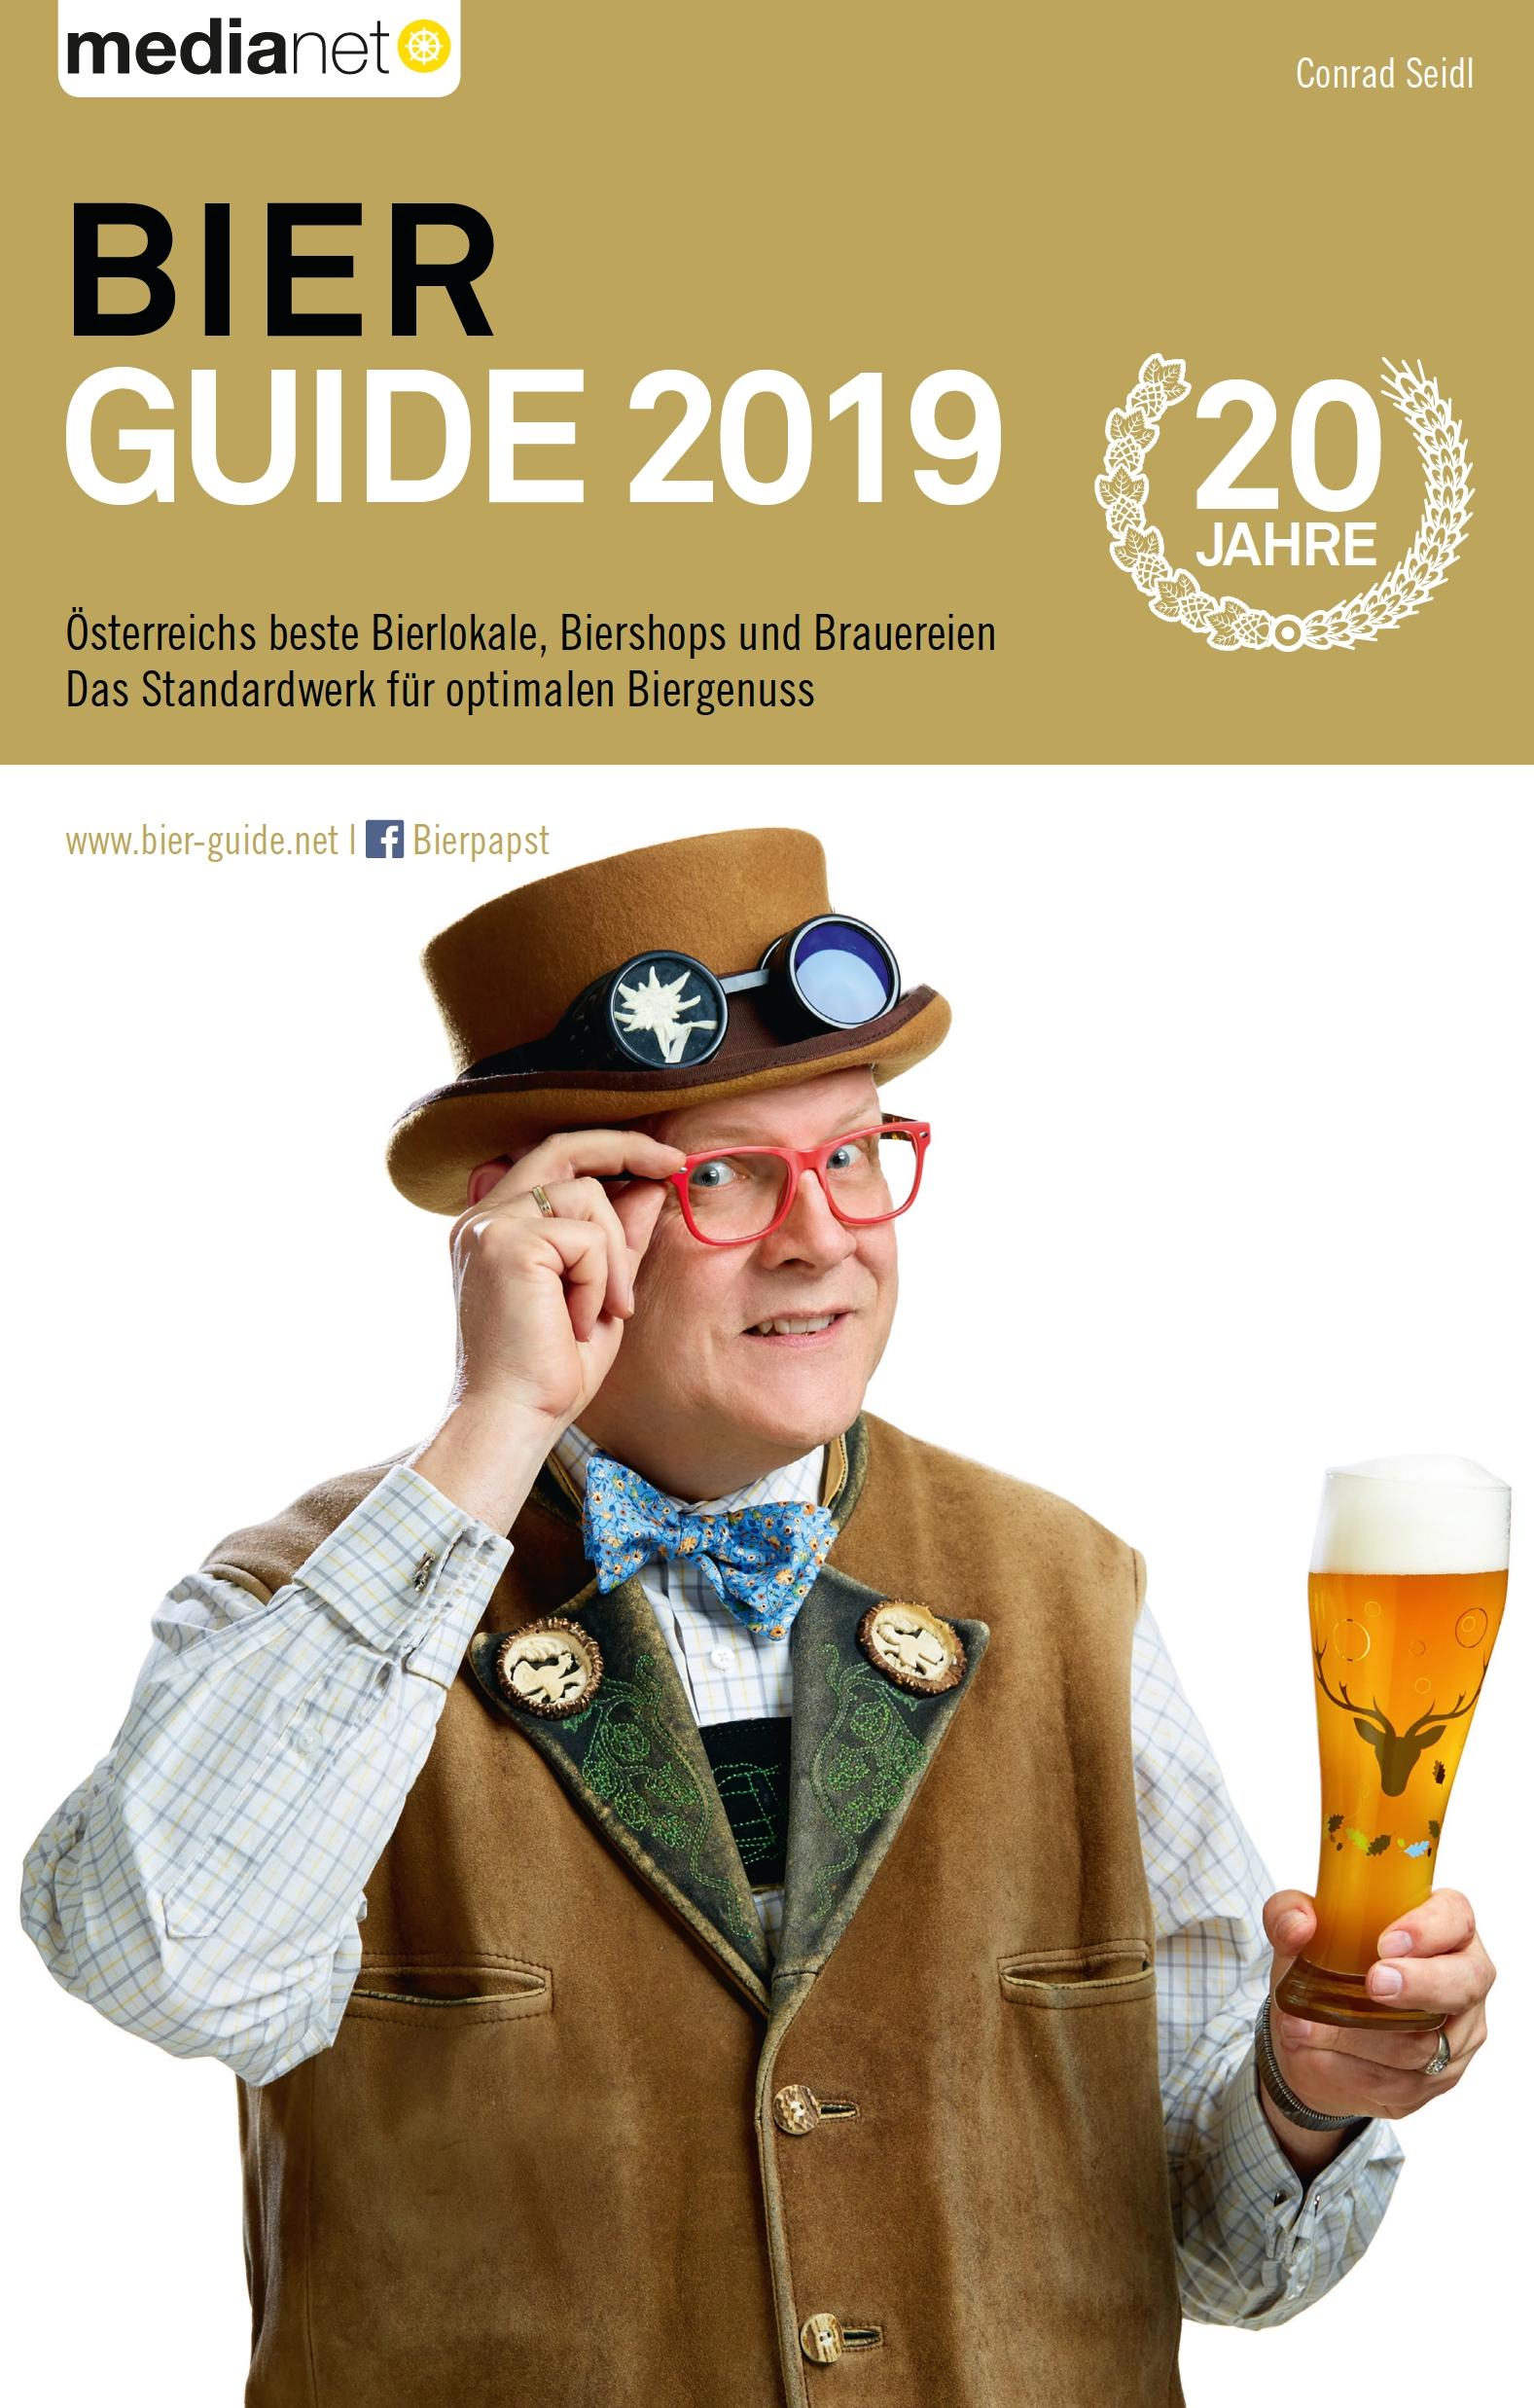 Titelbild des Bier Guide 2019